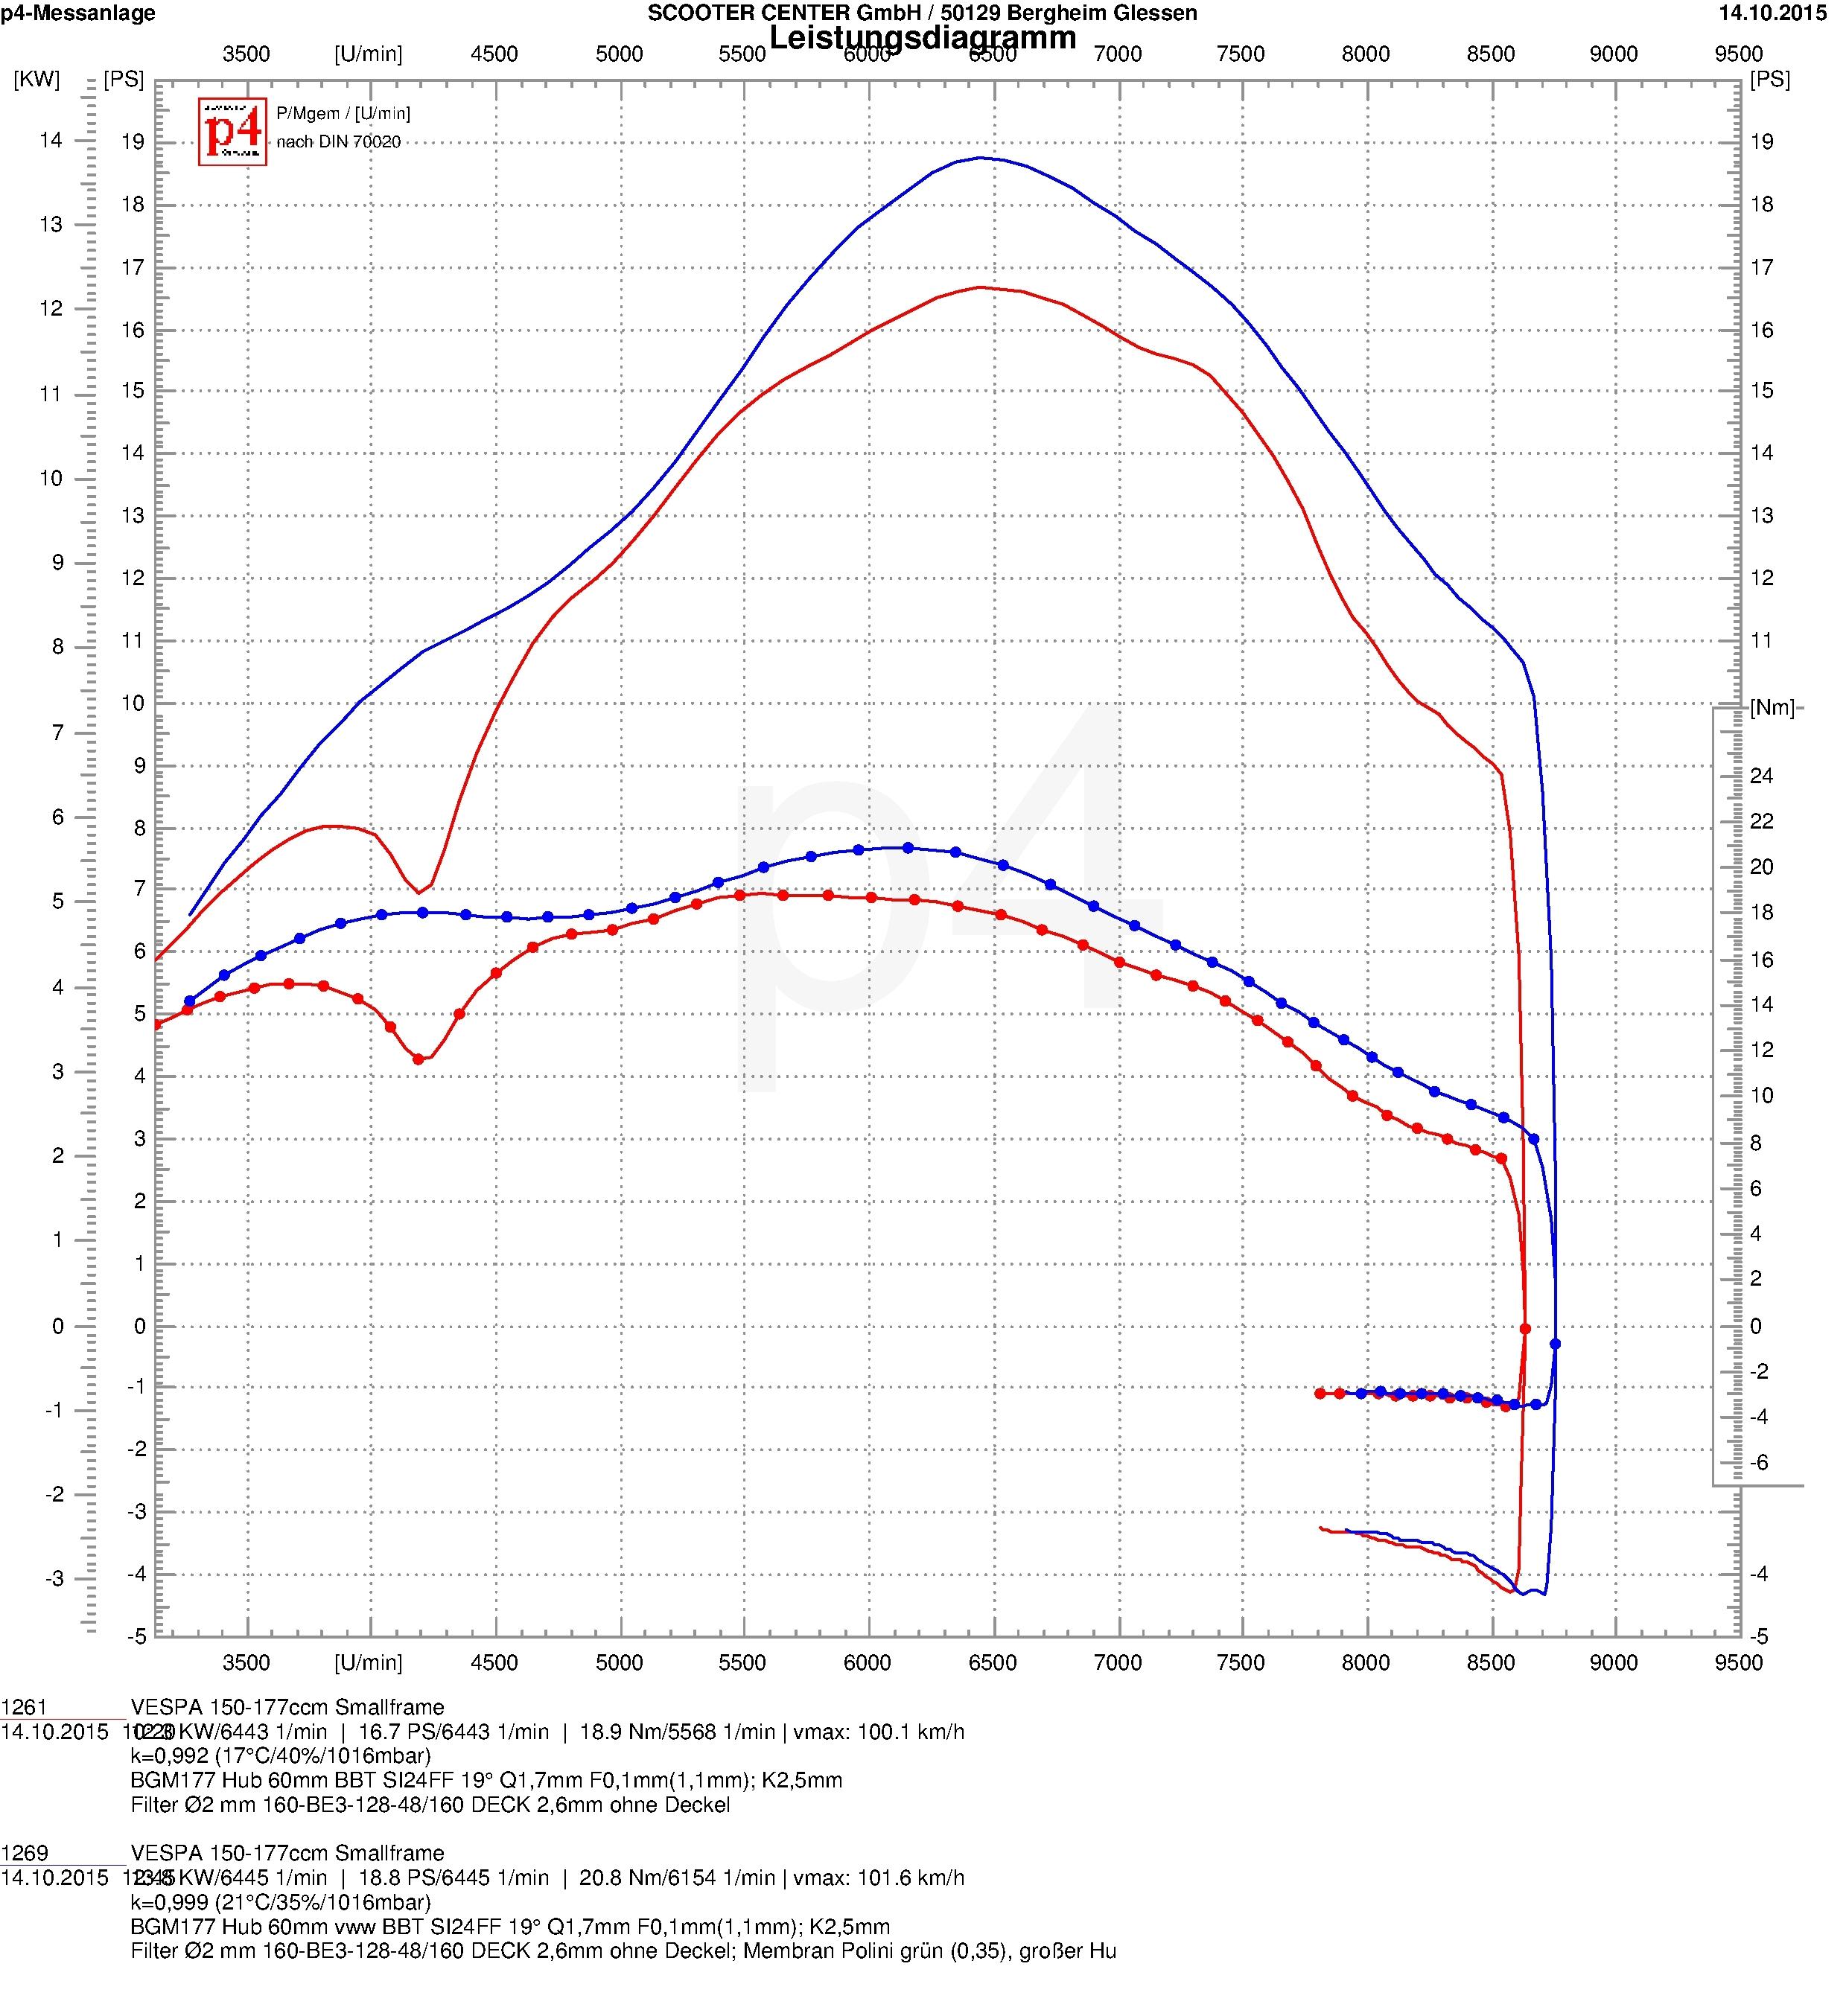 Engine Casing Lml Reed Valve Intake Elestart With Autolube Vespa Px125e Wiring Diagram Leistungsdiagramm Bgm177 Membran 60mm Vollwange Si24 3331845